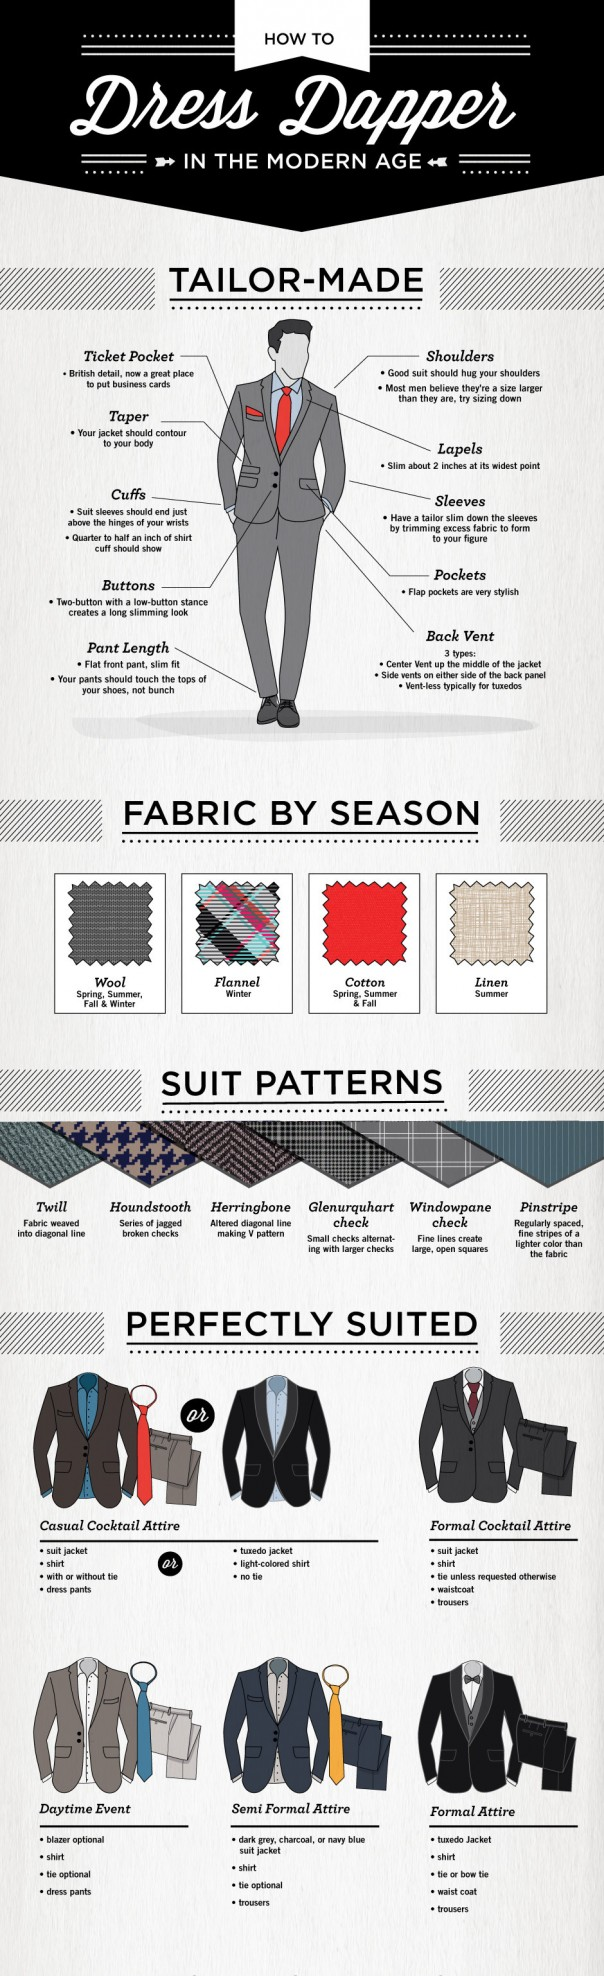 How_to_Dress_Daper_WEB_5a